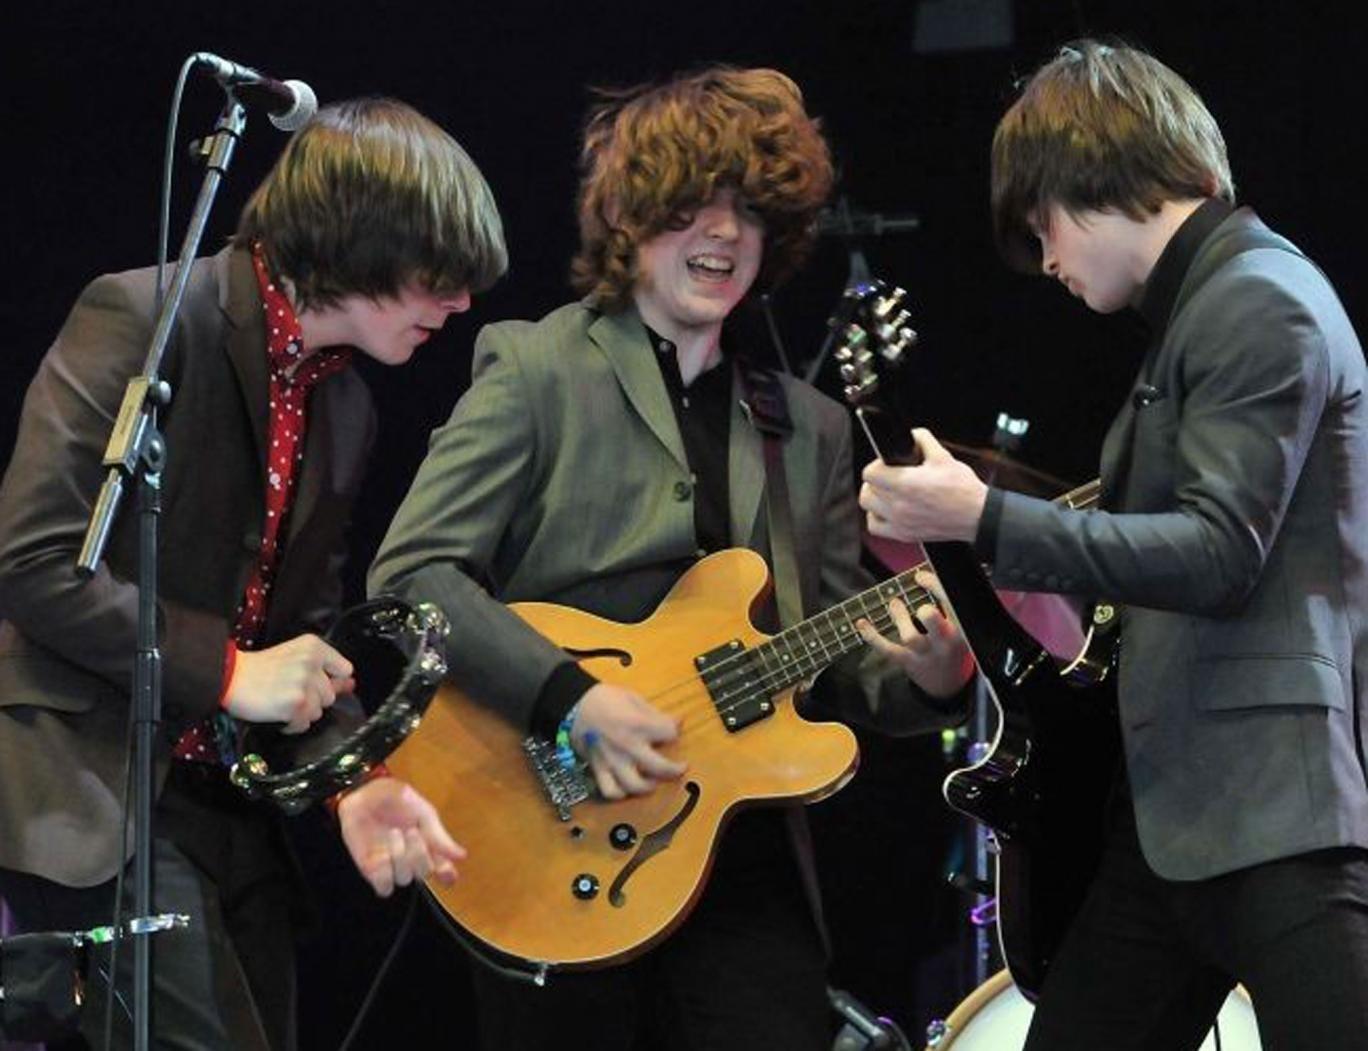 Ross Farrelly, Pete O'Hanlon and Josh McClorey of The Strypes perform on Glastonbury's John Peel stage